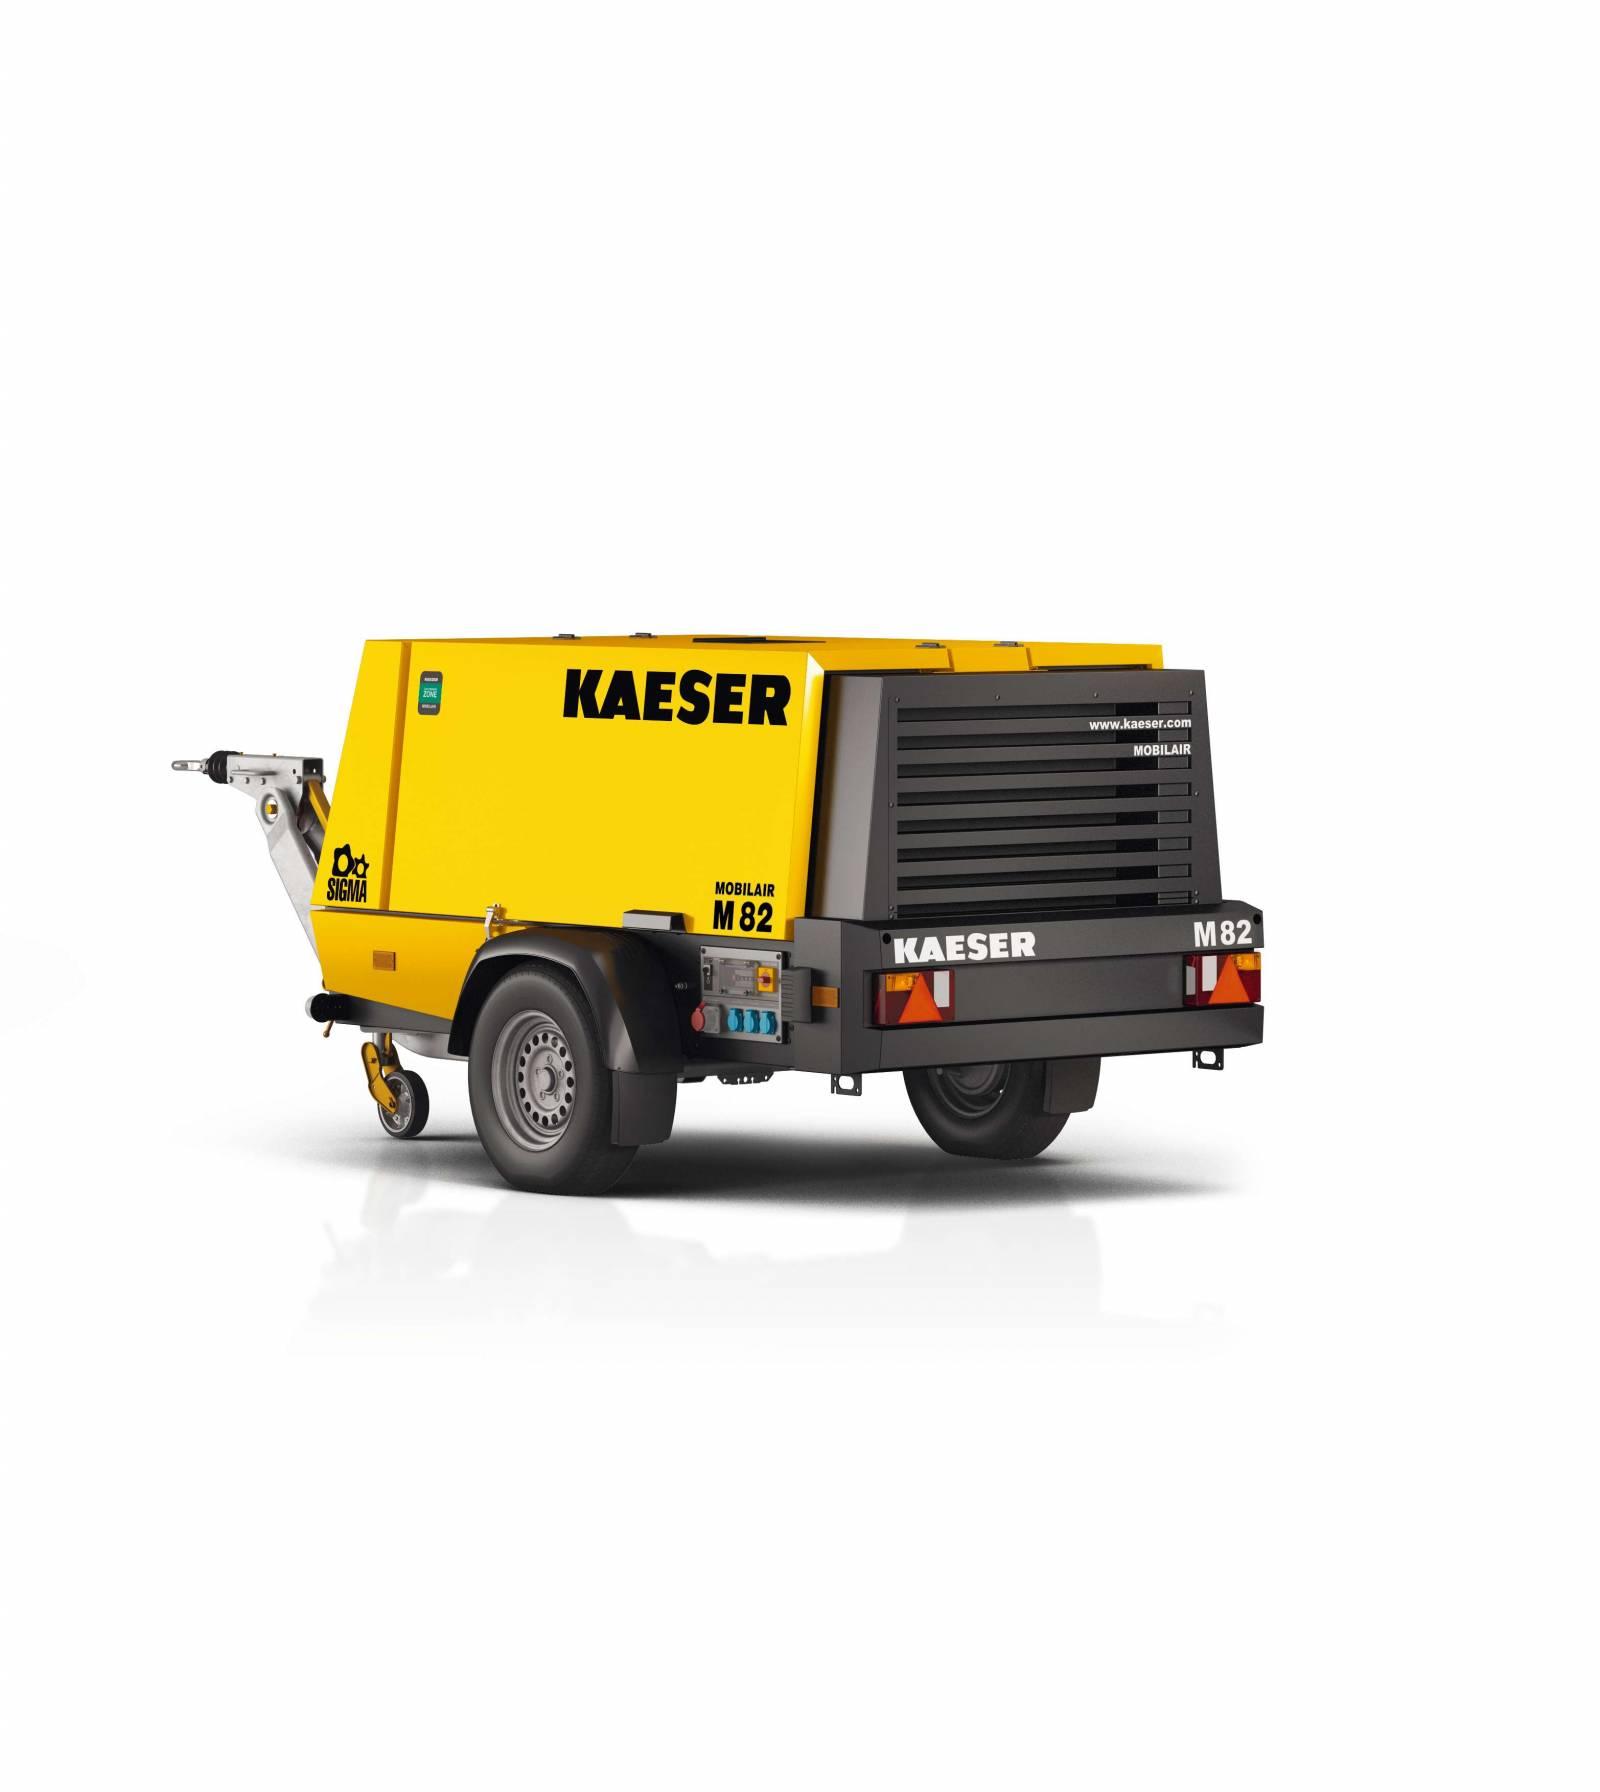 Kompressor KAESER M_82